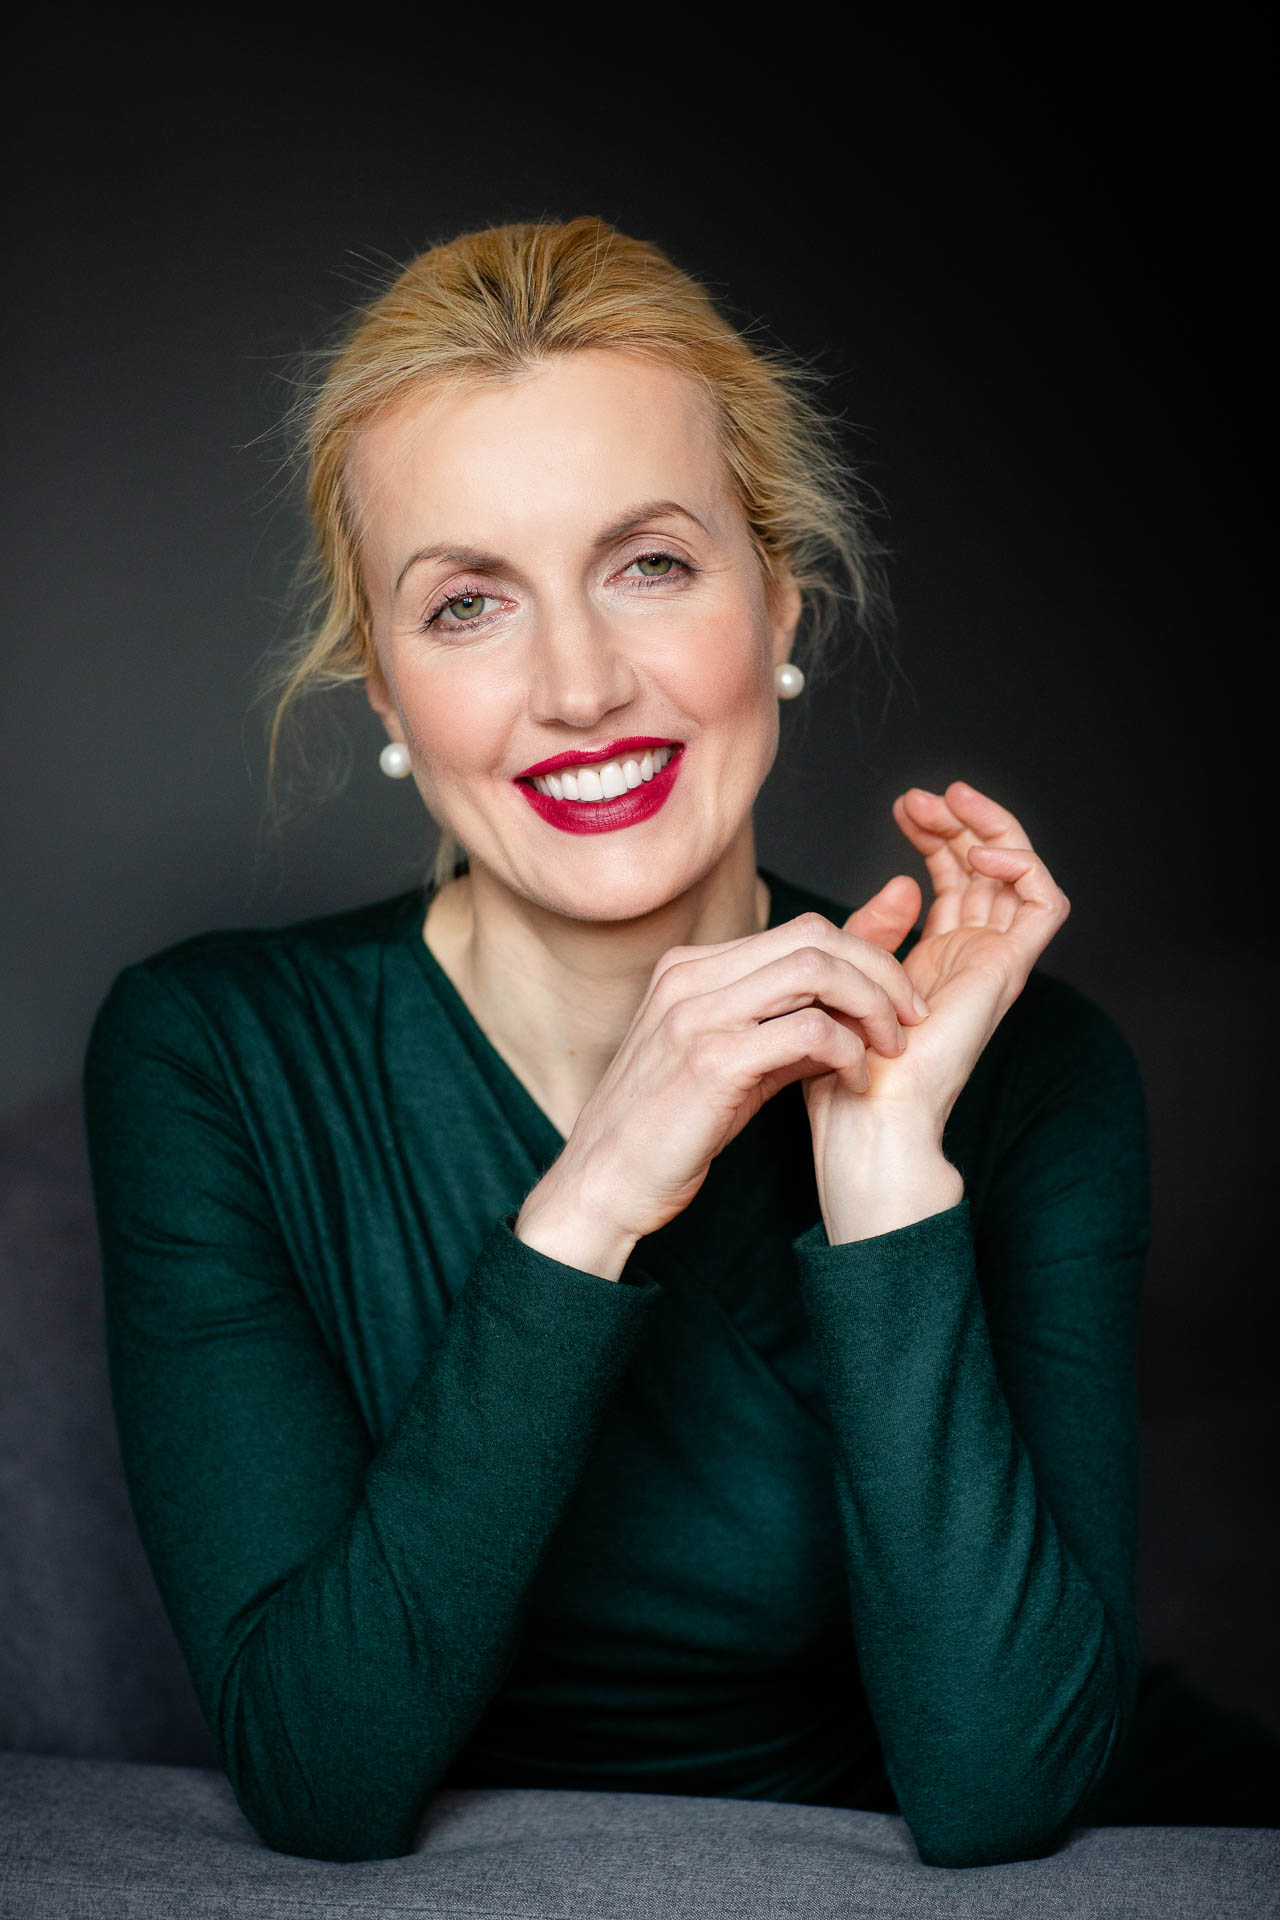 studio headshot of blonde lady in green dress